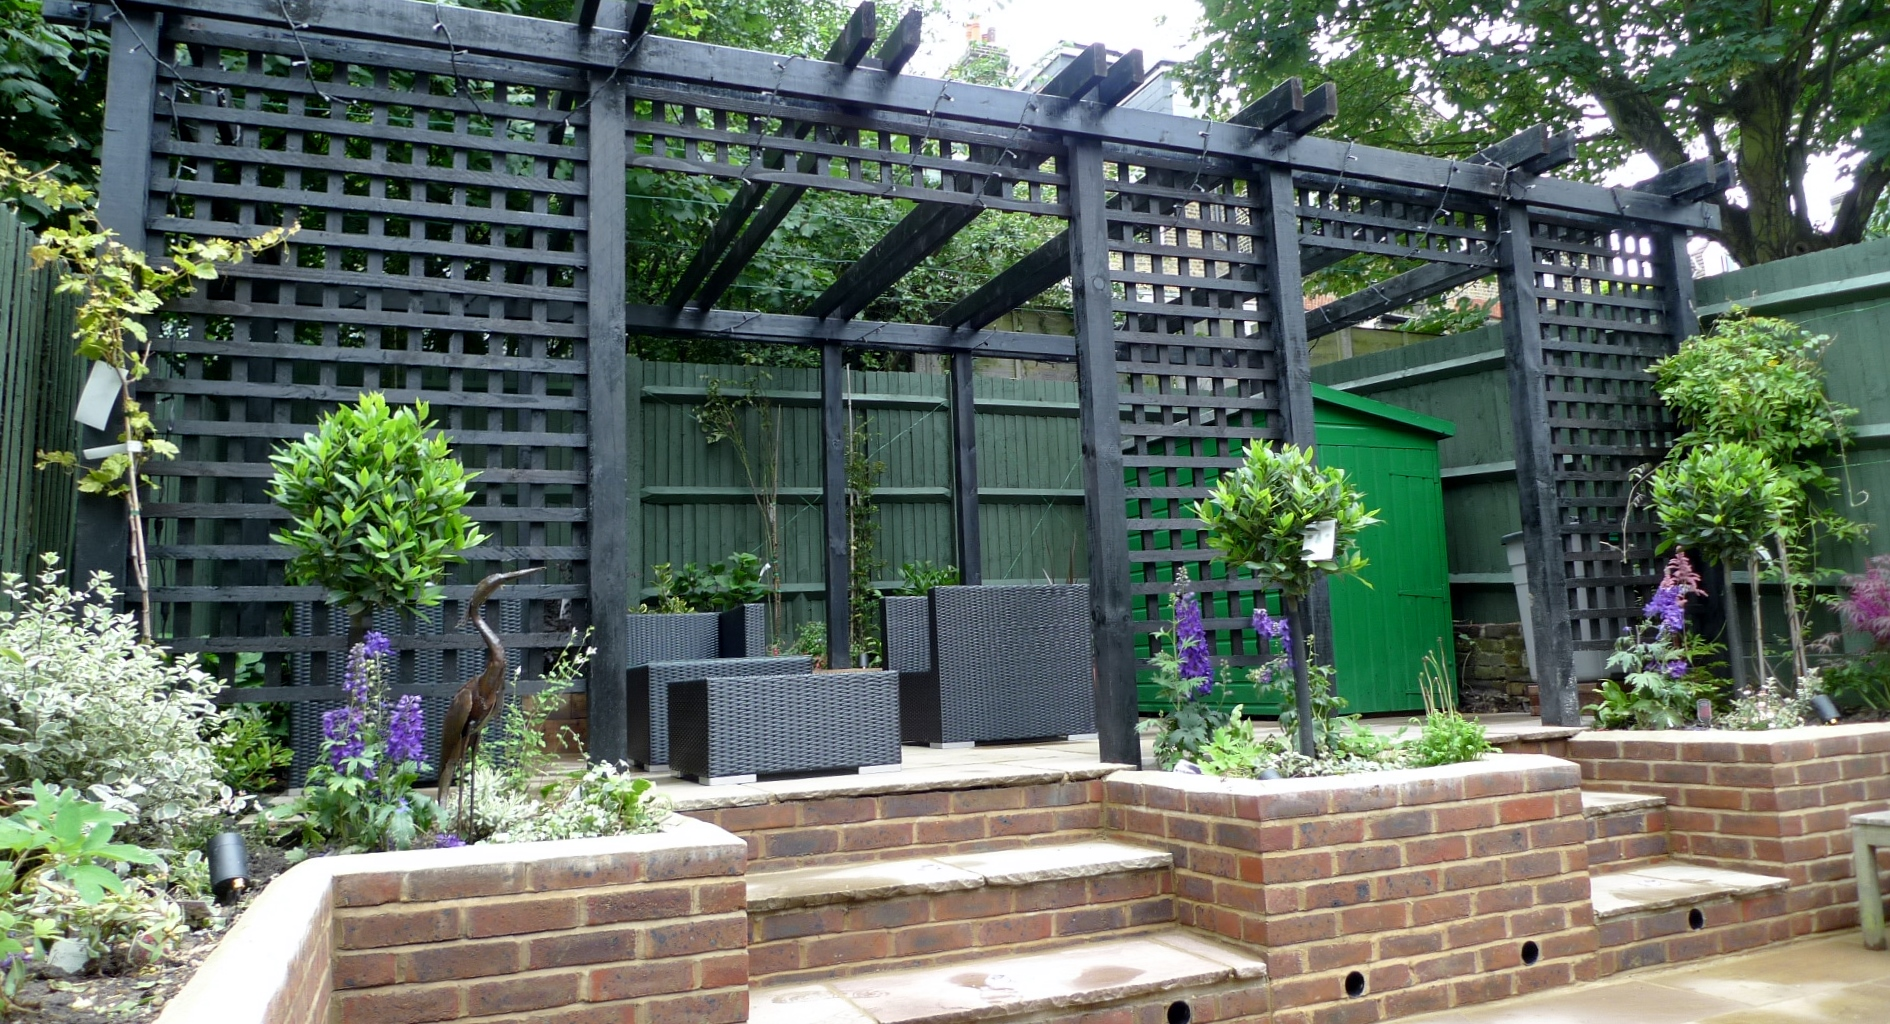 Garden walls pergola paving steps planting design designer ... on Garden Patio Wall Ideas id=56188